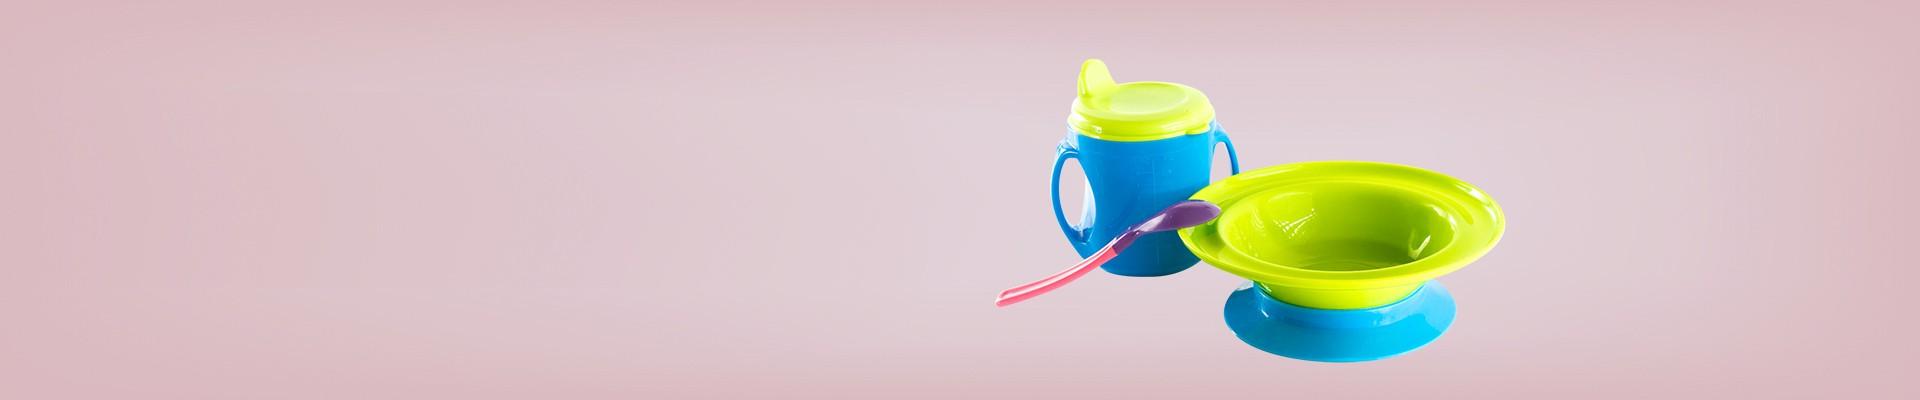 Jual Perlengkapan Makan Bayi Lengkap Terbaik